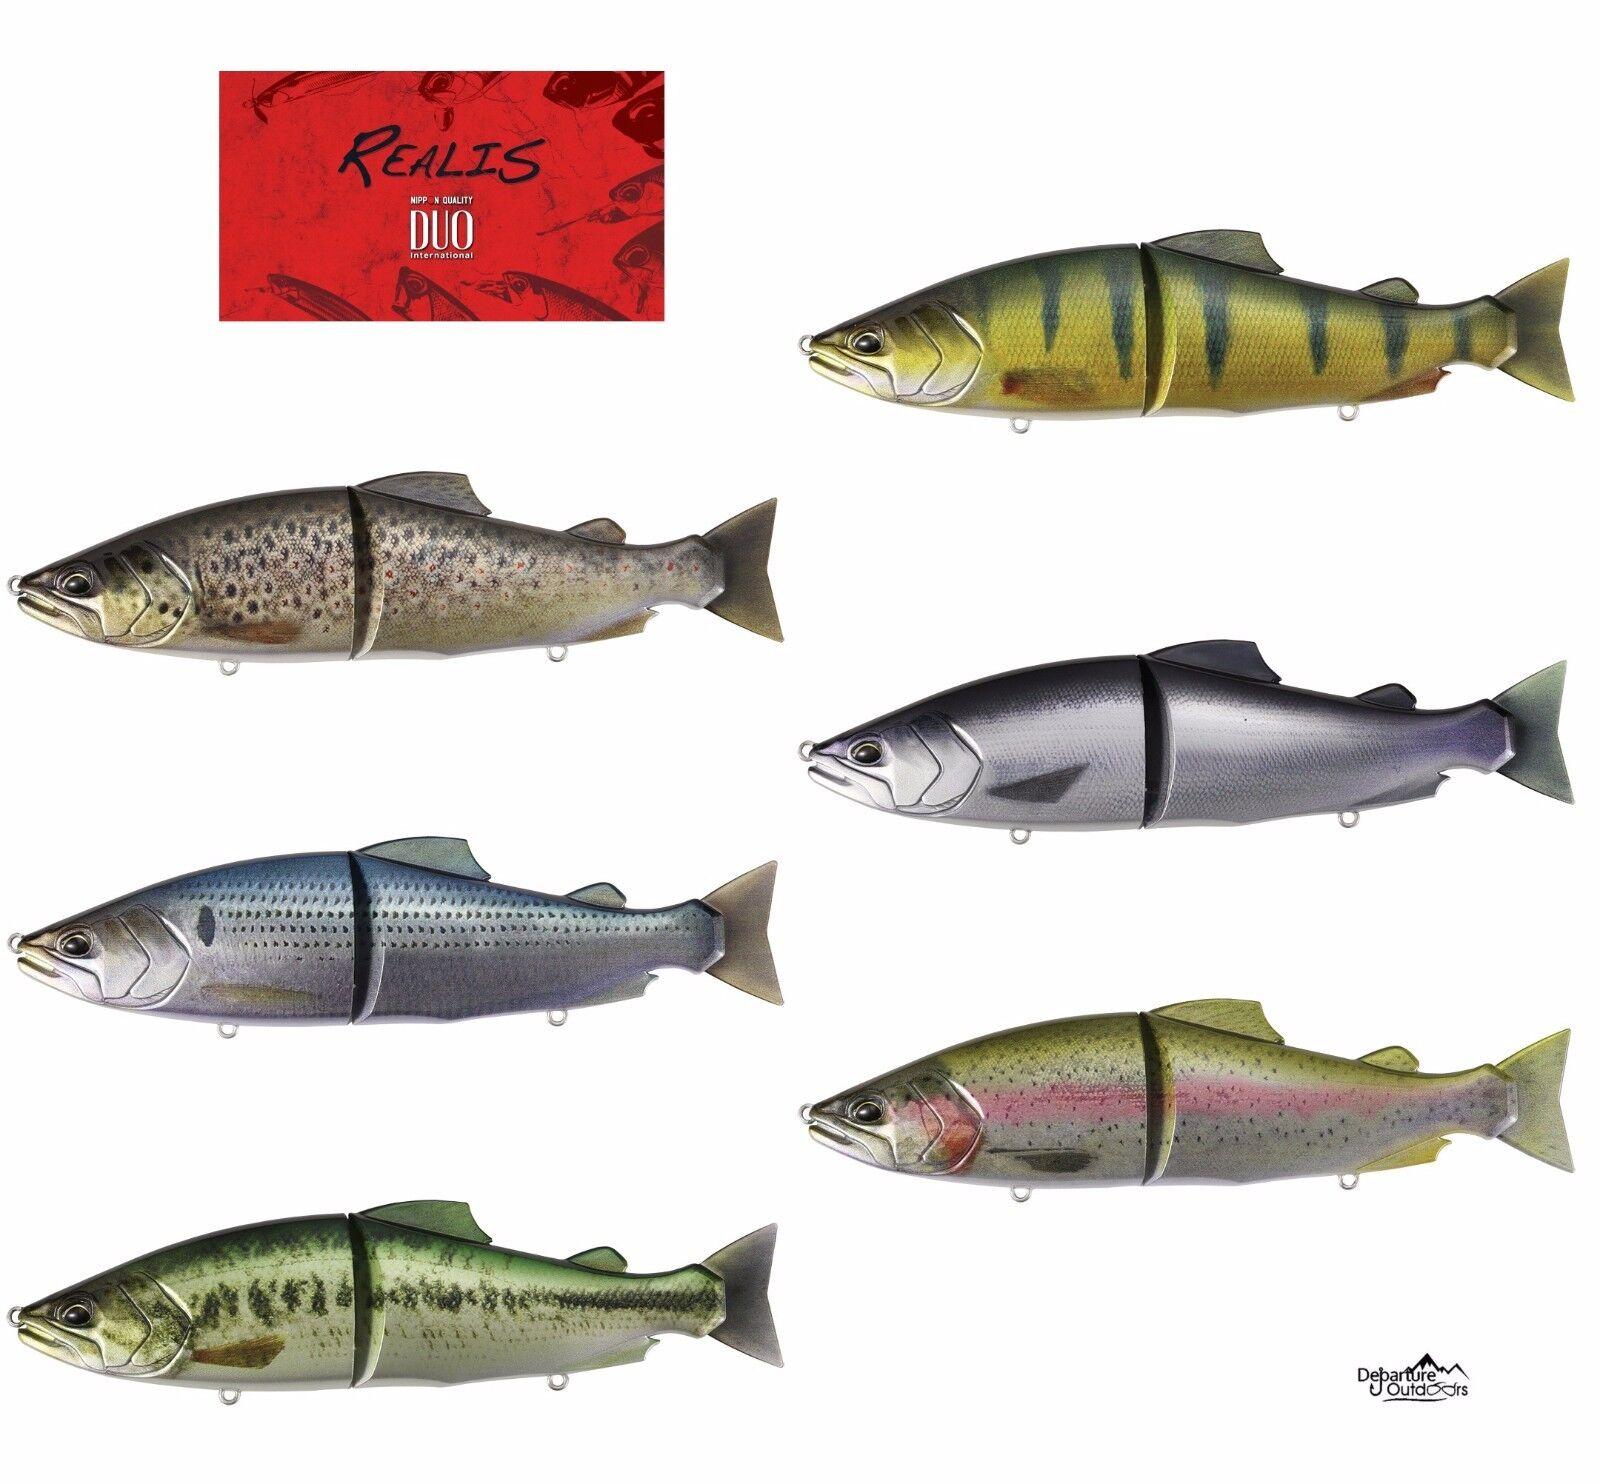 Duo Realis Onimasu Sinre  Swimbait Glide Bait JDM Bass Fishing Lure